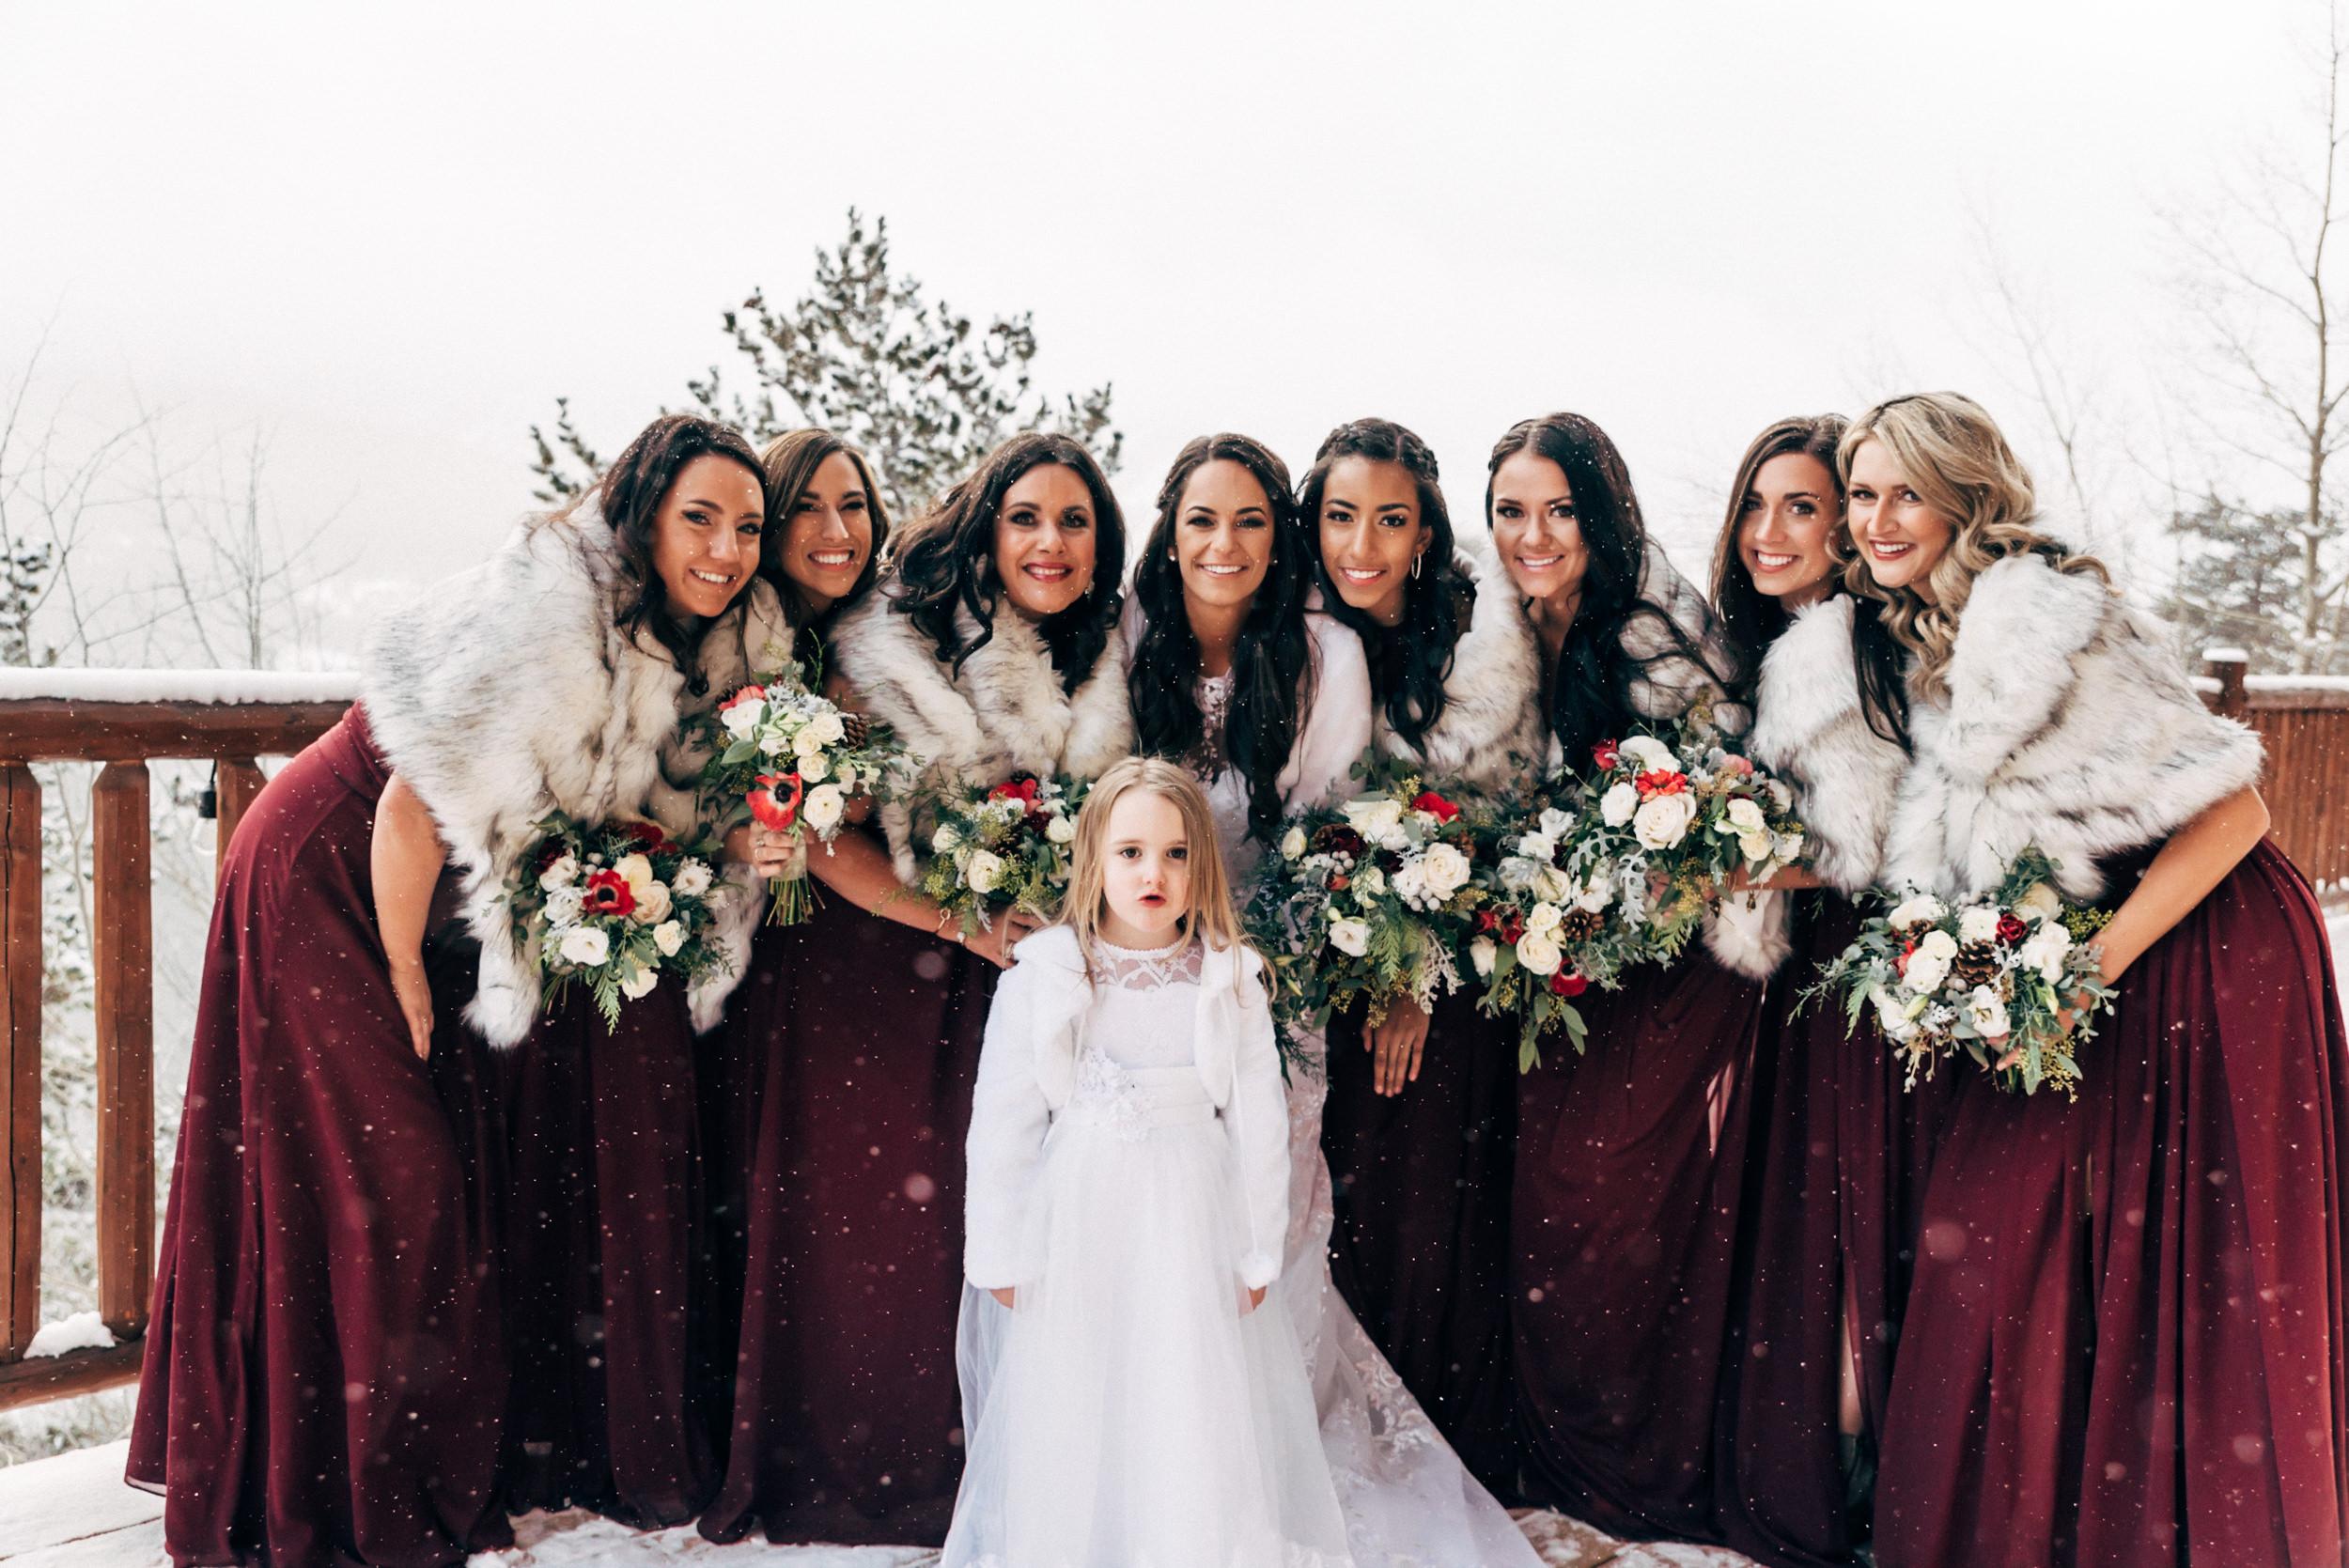 Colorado-Wedding-Photographer-Breckinridge-Mountain-Adventure-Elopement-46.jpg